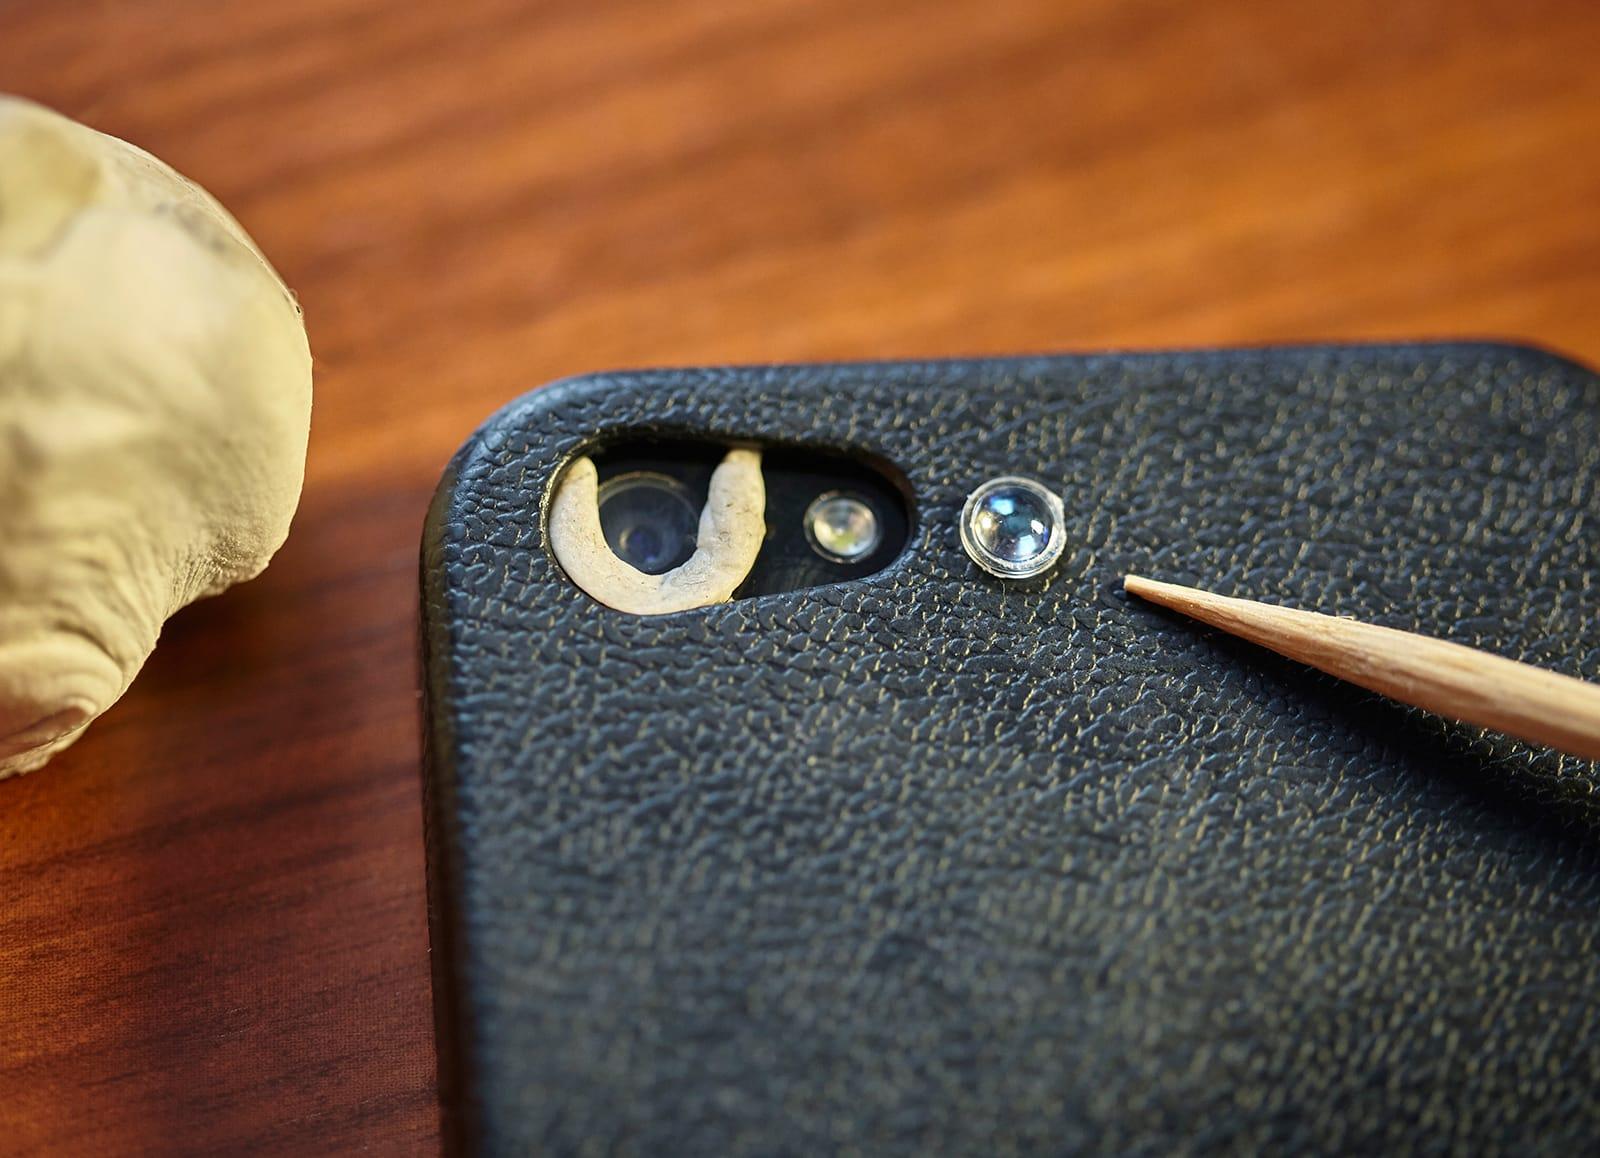 Creative Hack Gives You Stunning iPhone Macro Shots